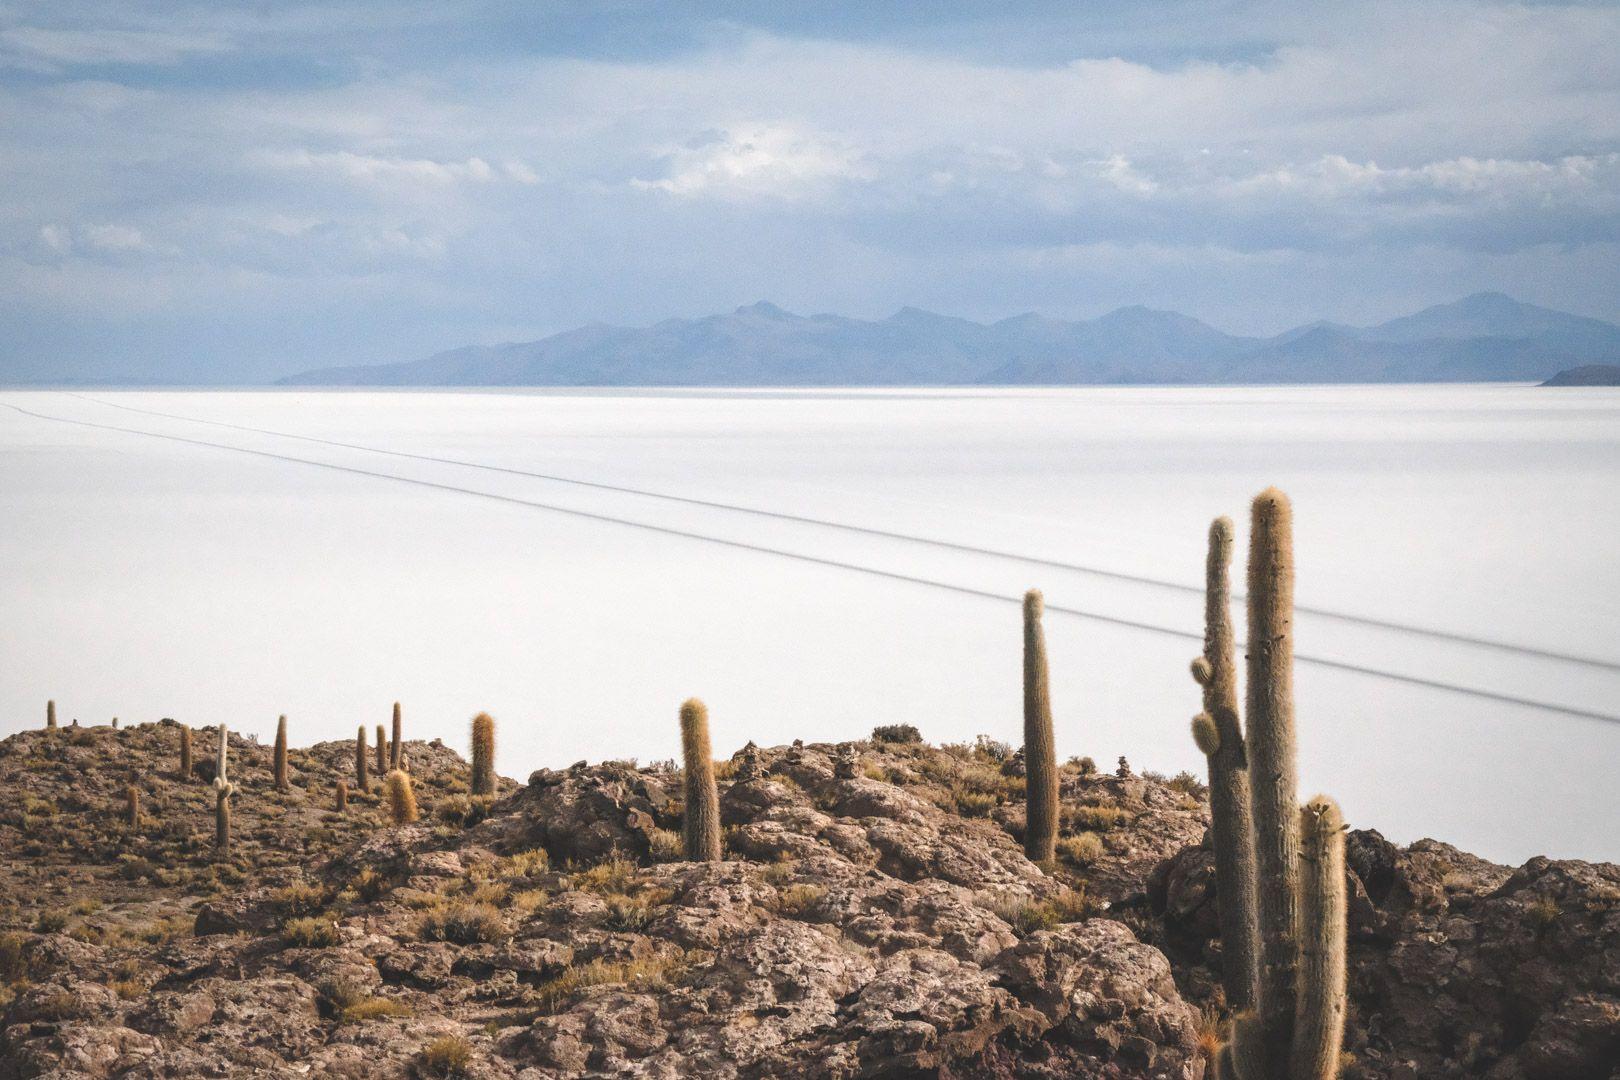 Incahuasi dans le désert d'Uyuni